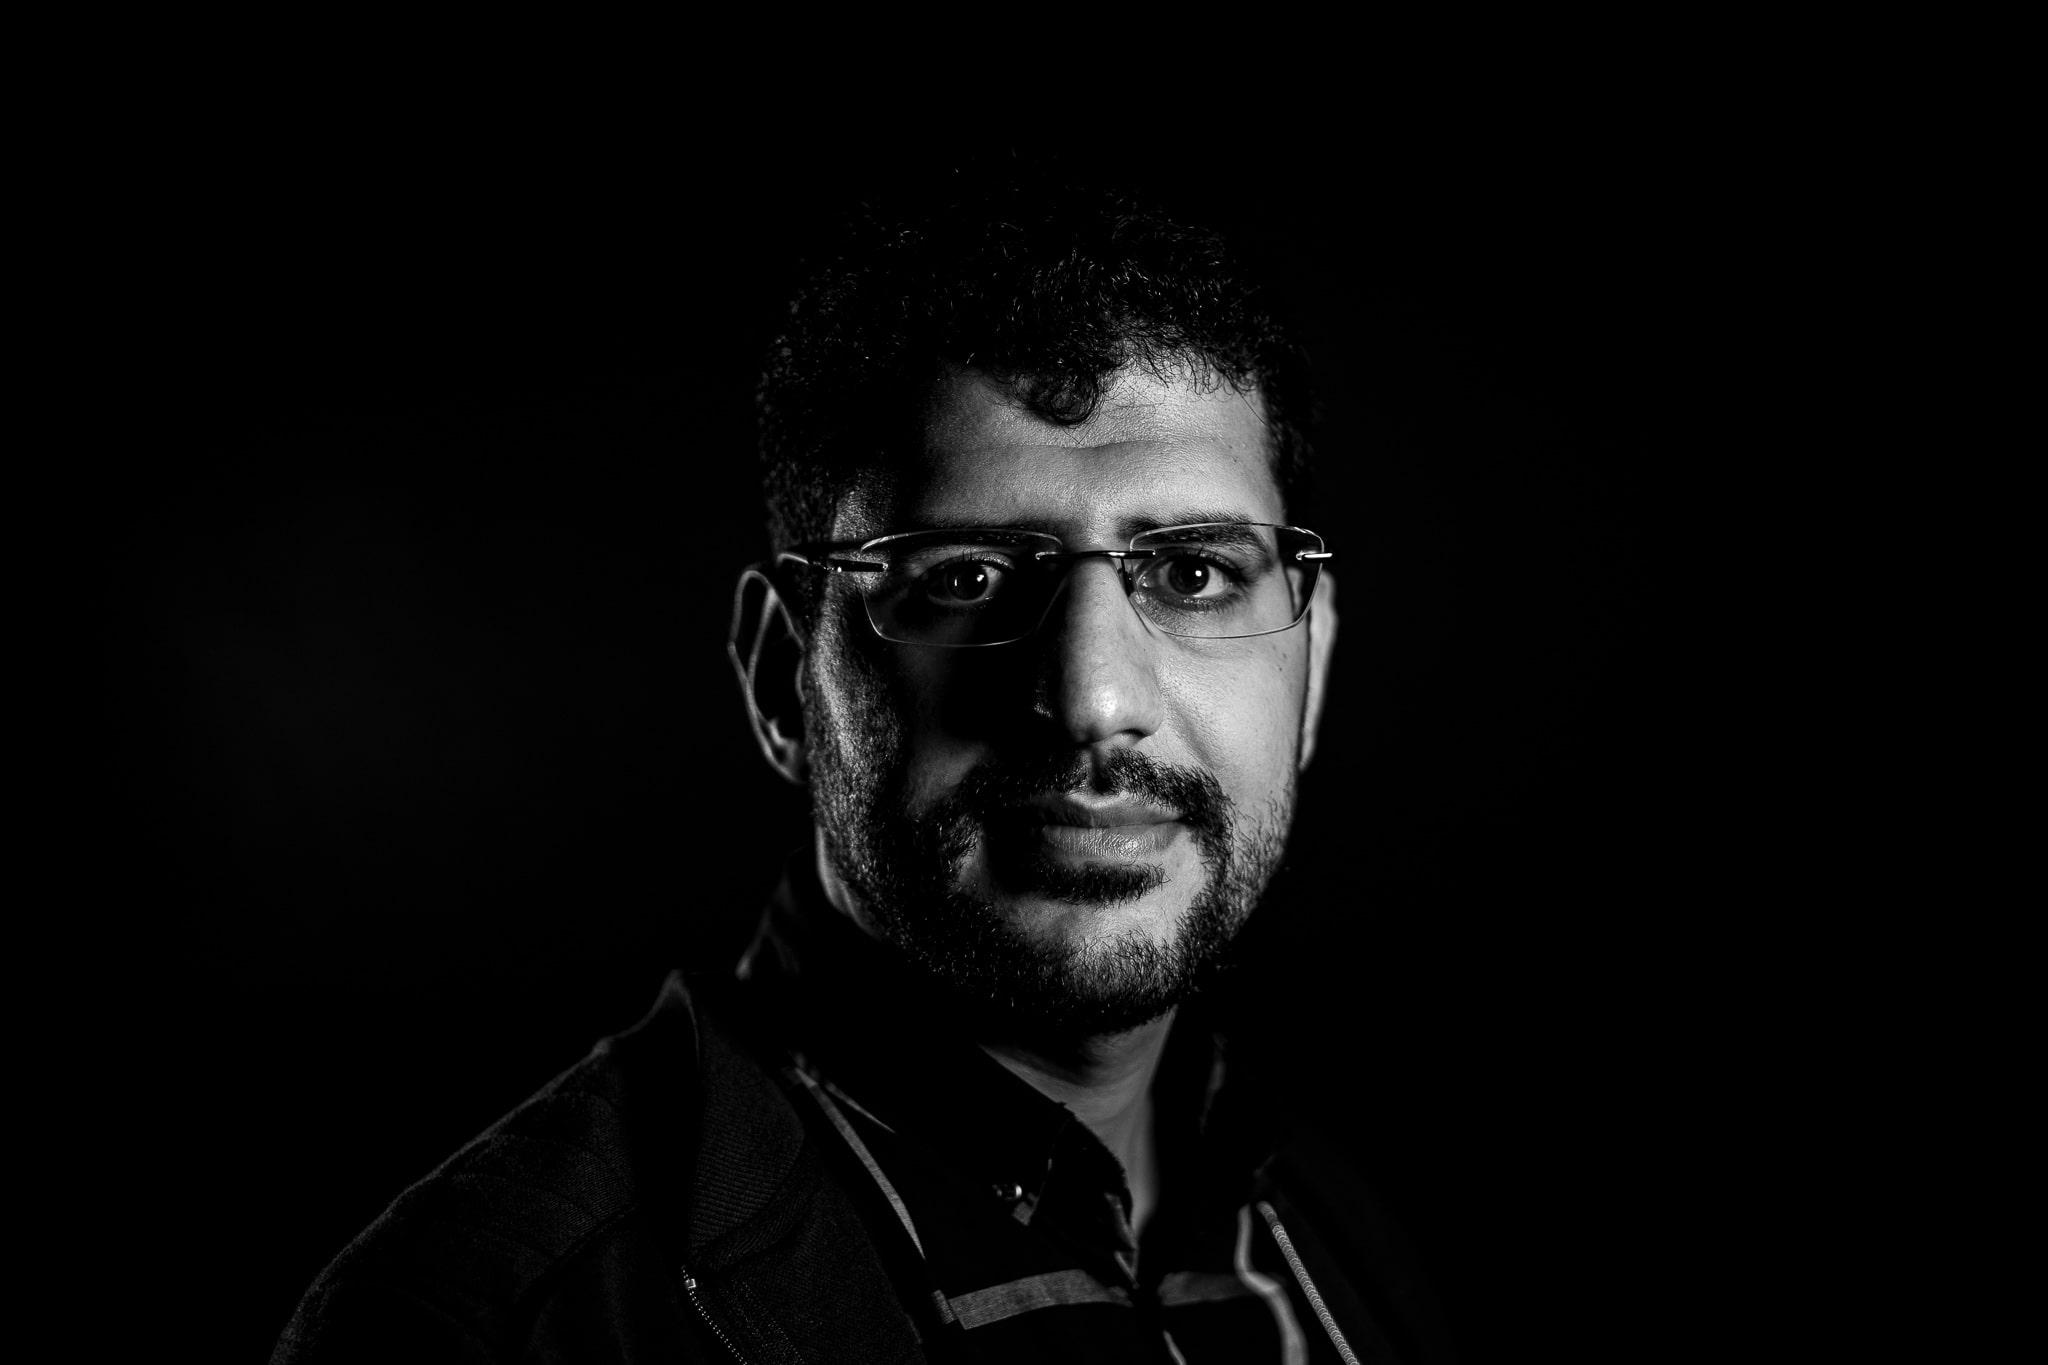 Abdul Majeed Alkattan